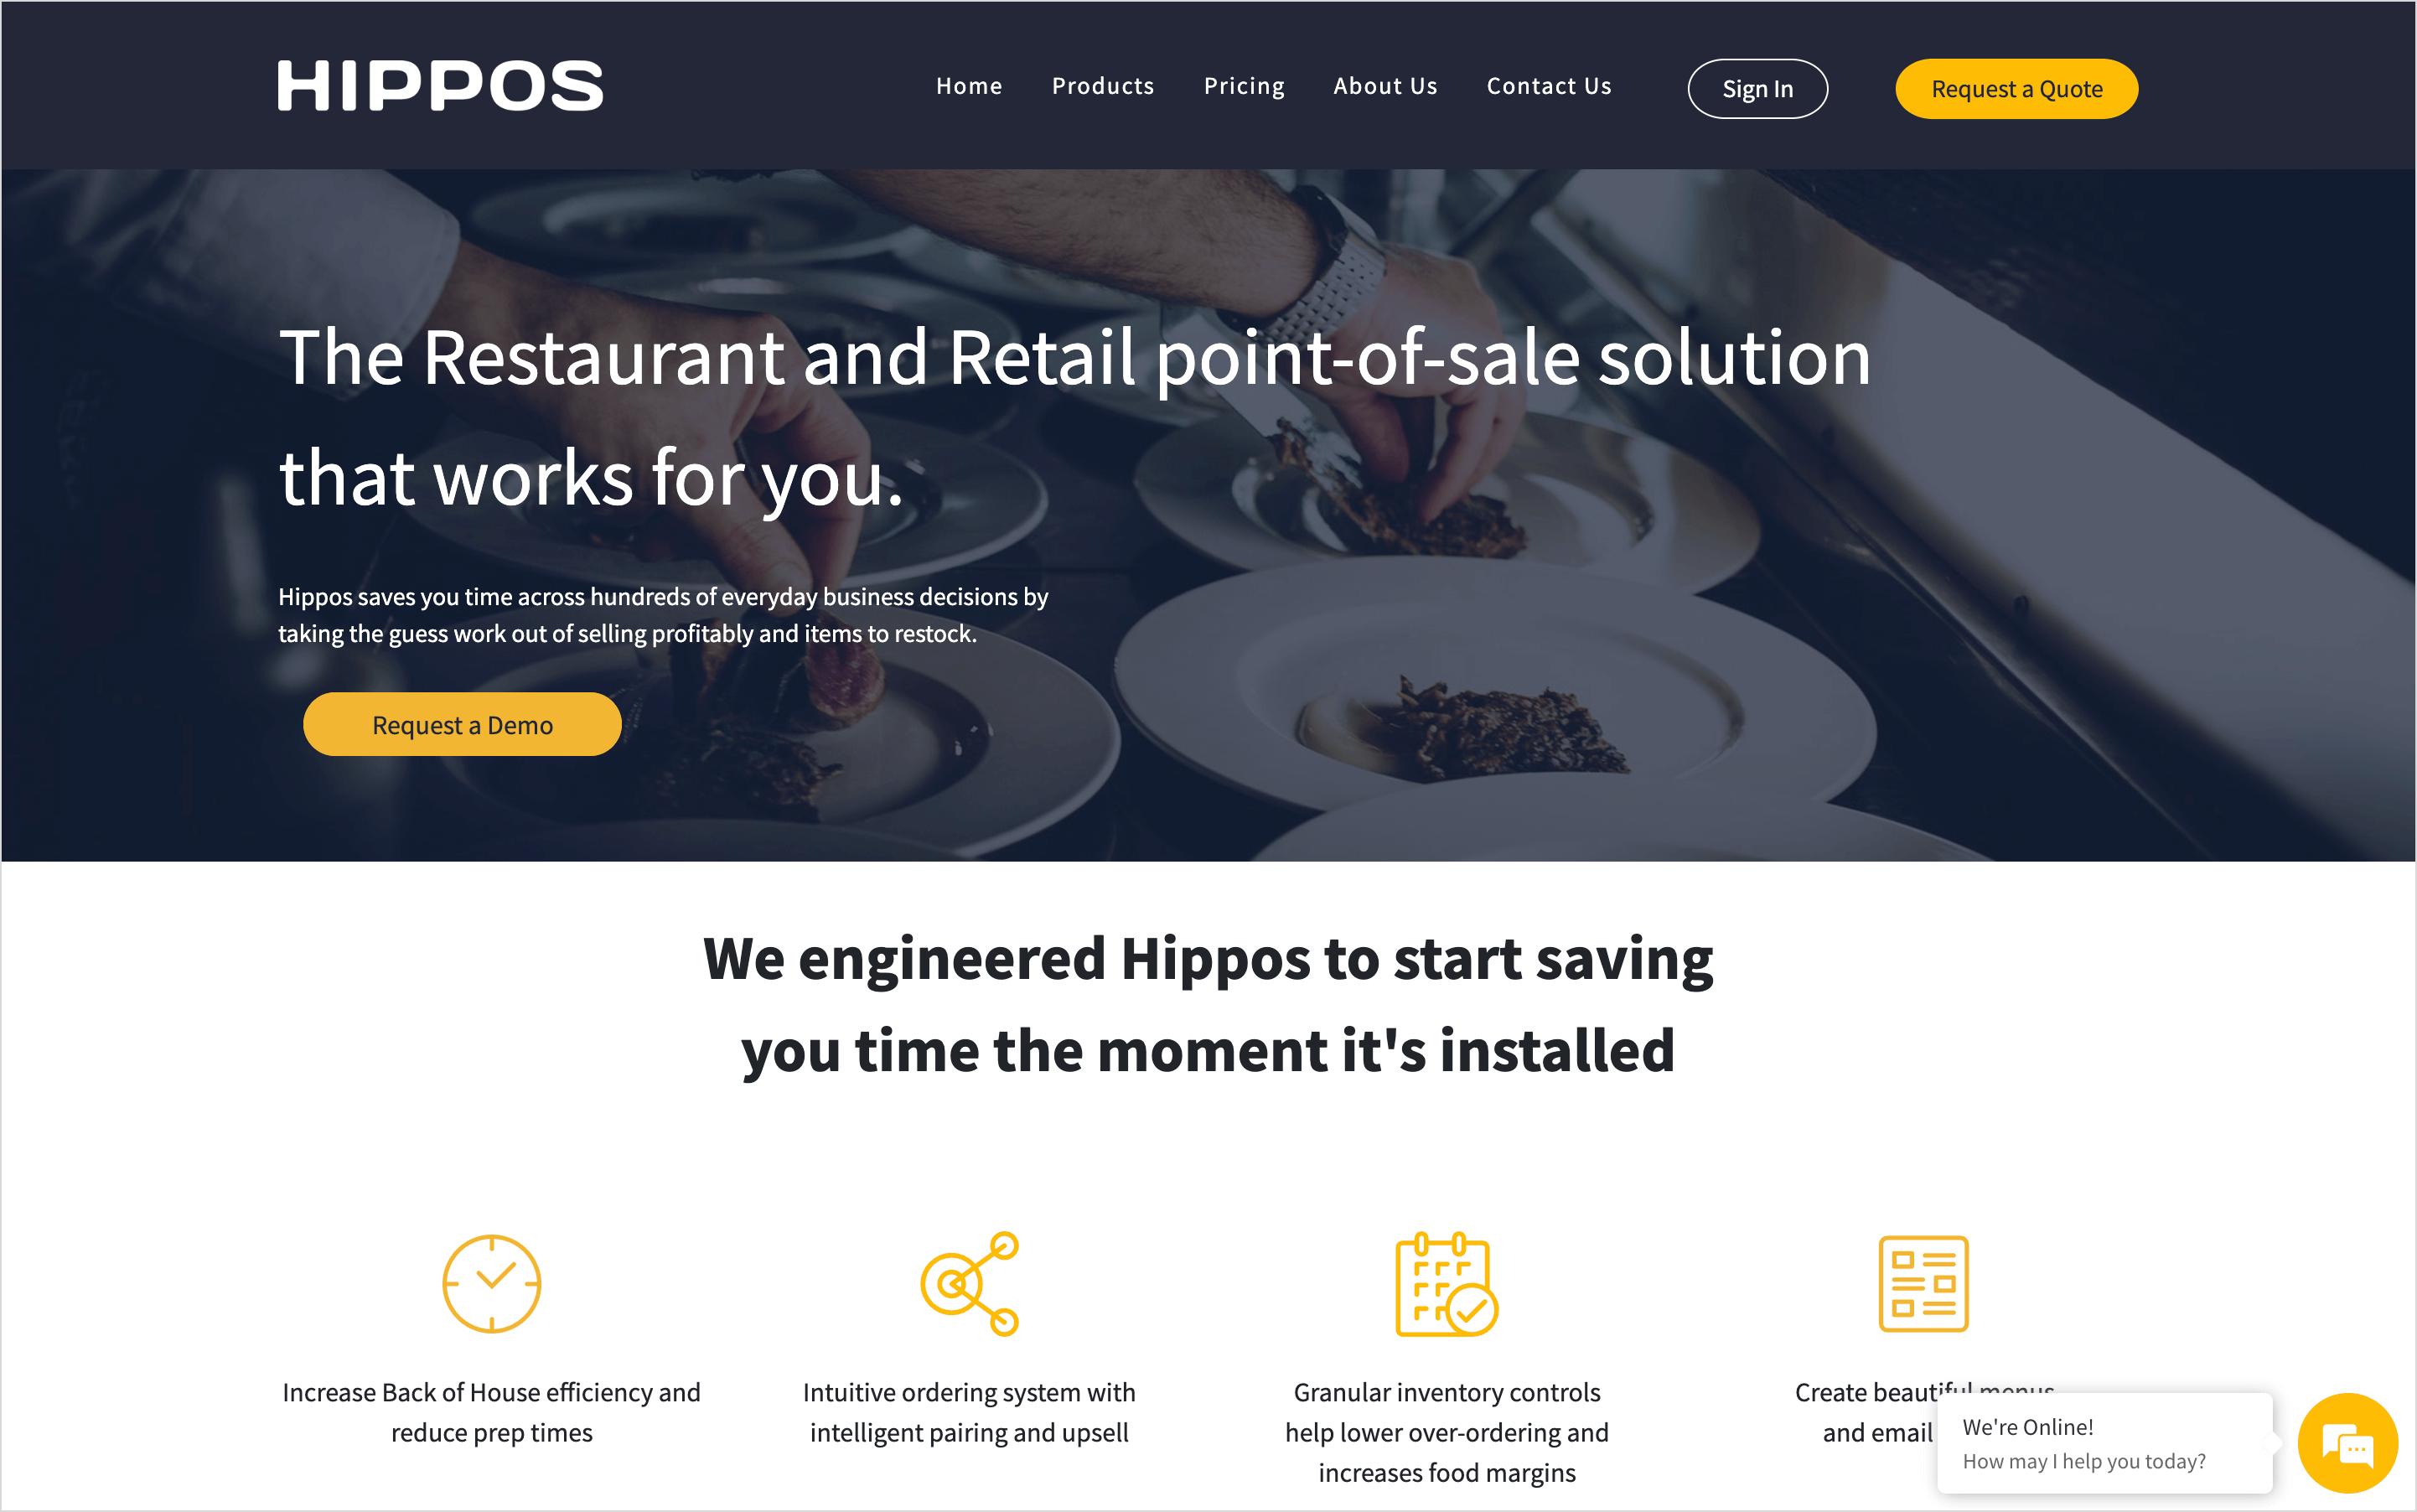 hippos homepage